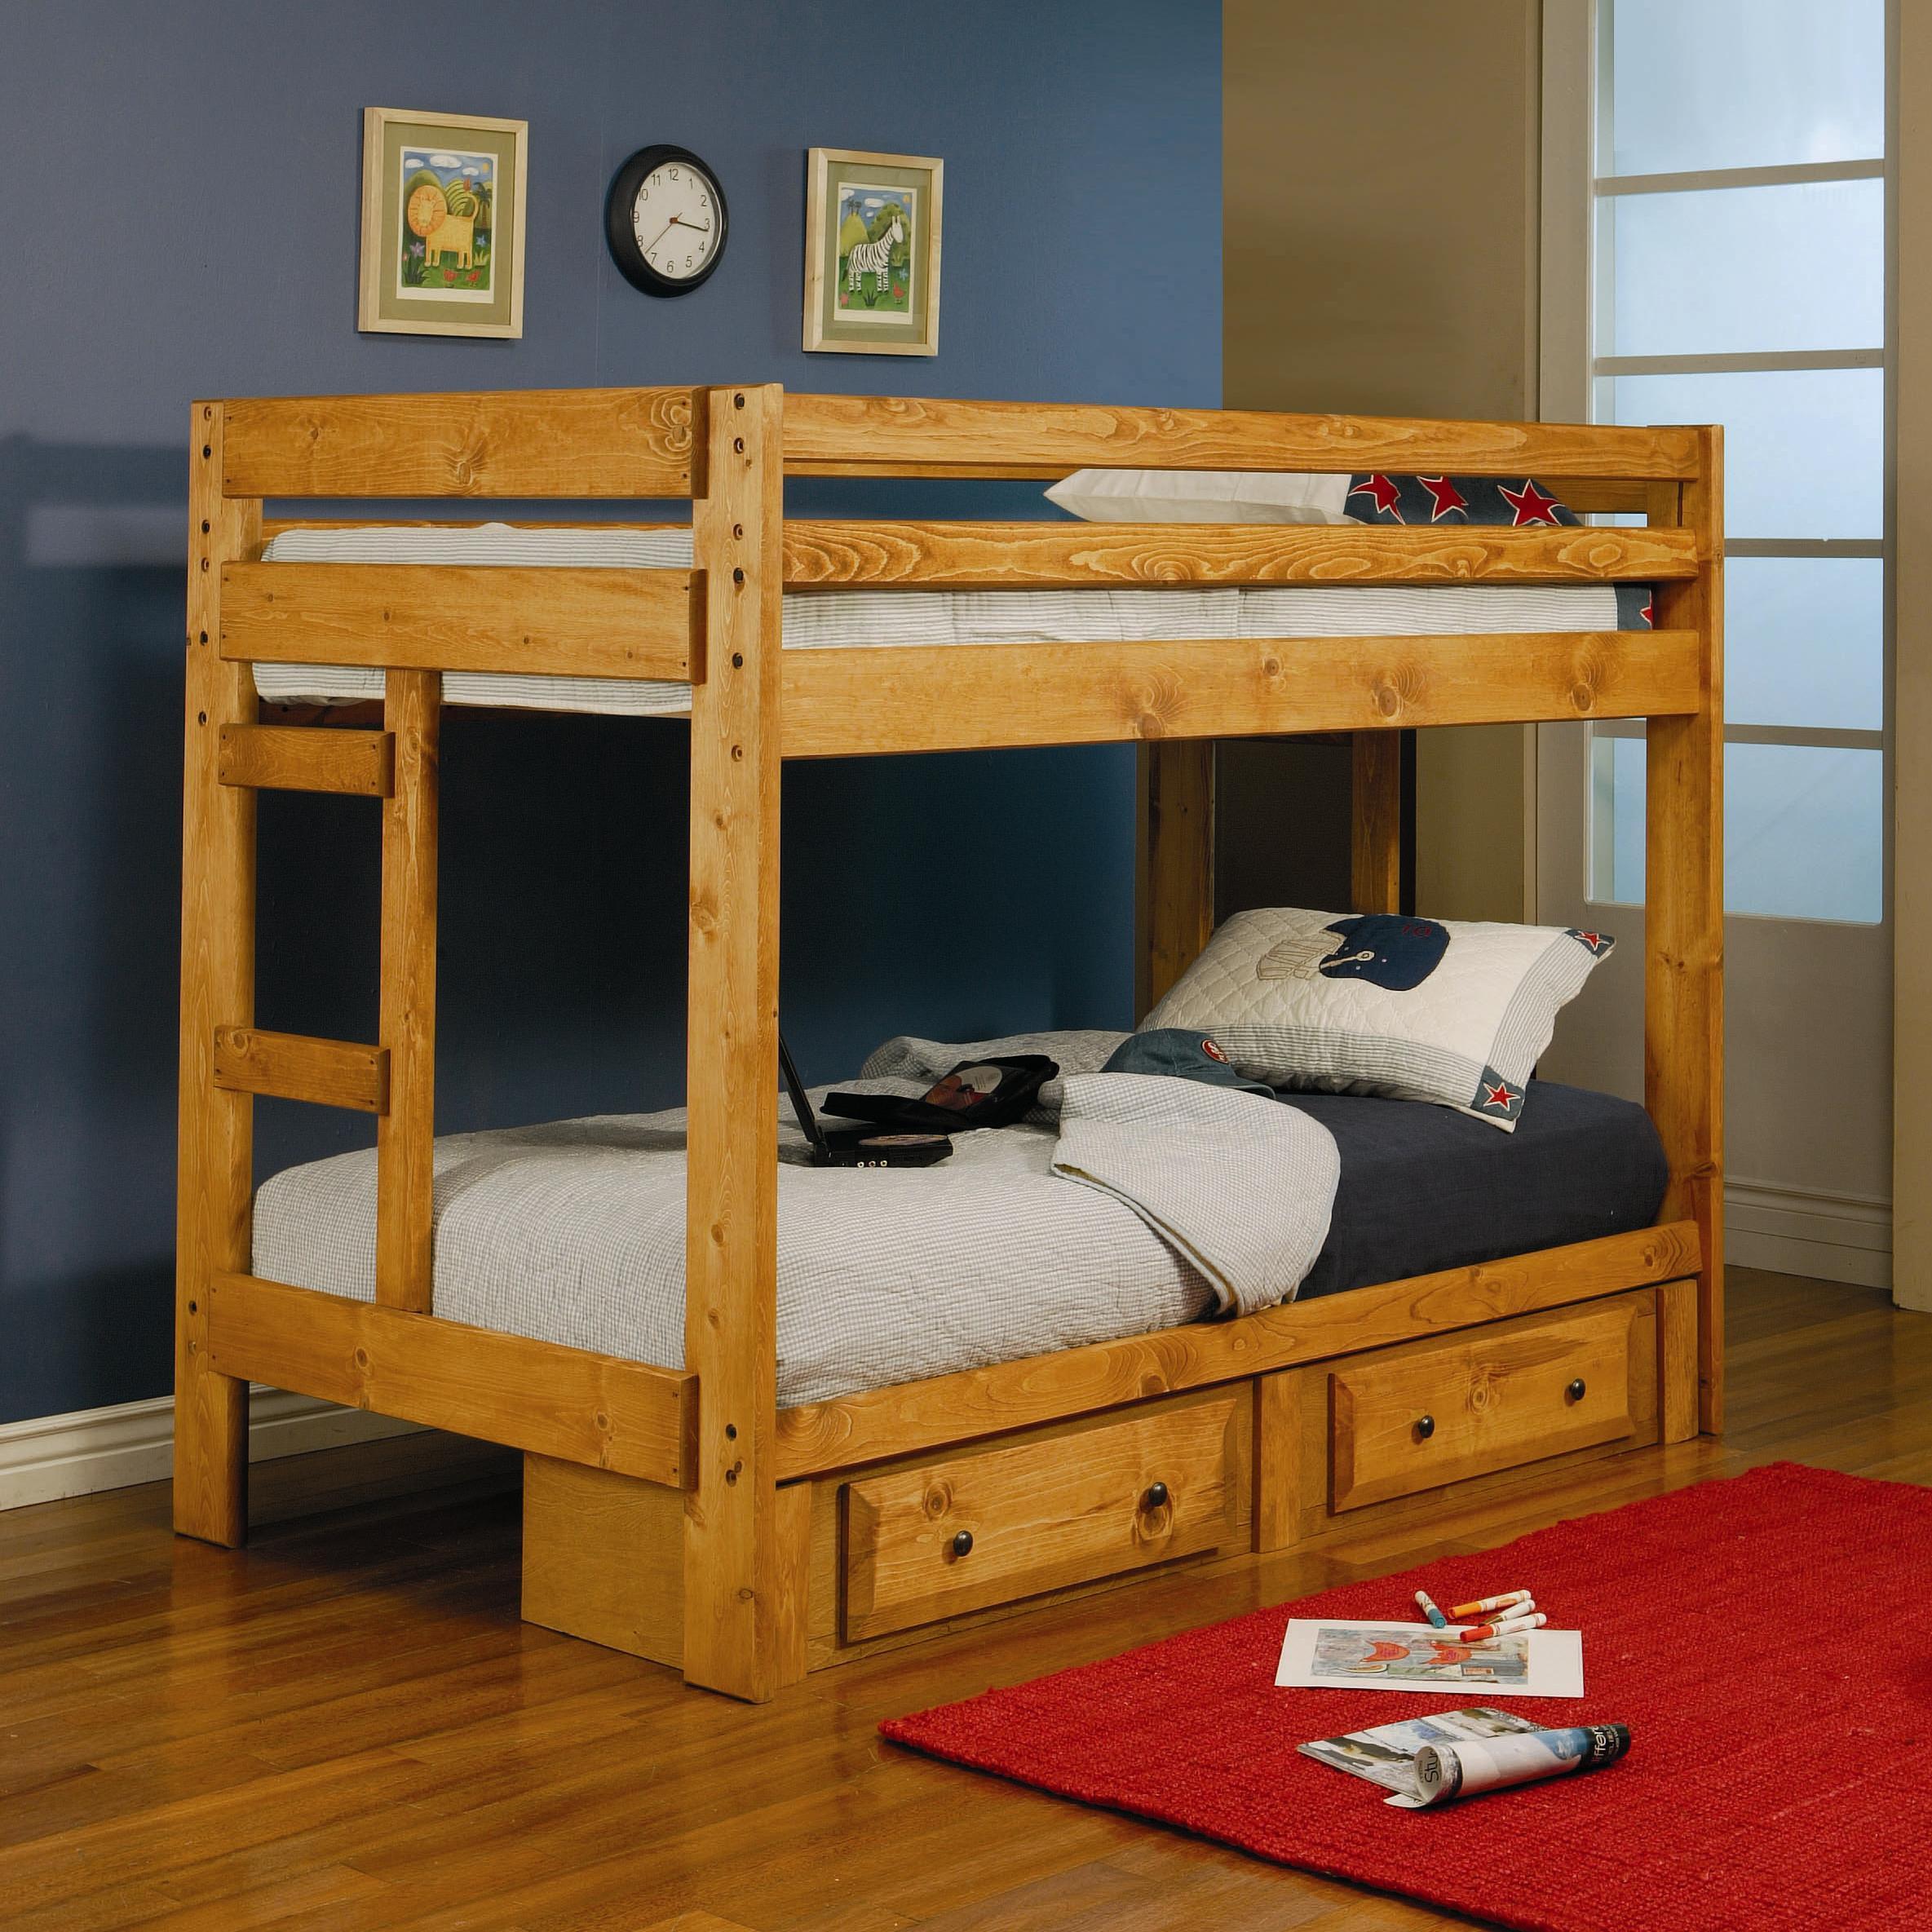 Coaster Furniture - Wrangle Hill Bunk Bed